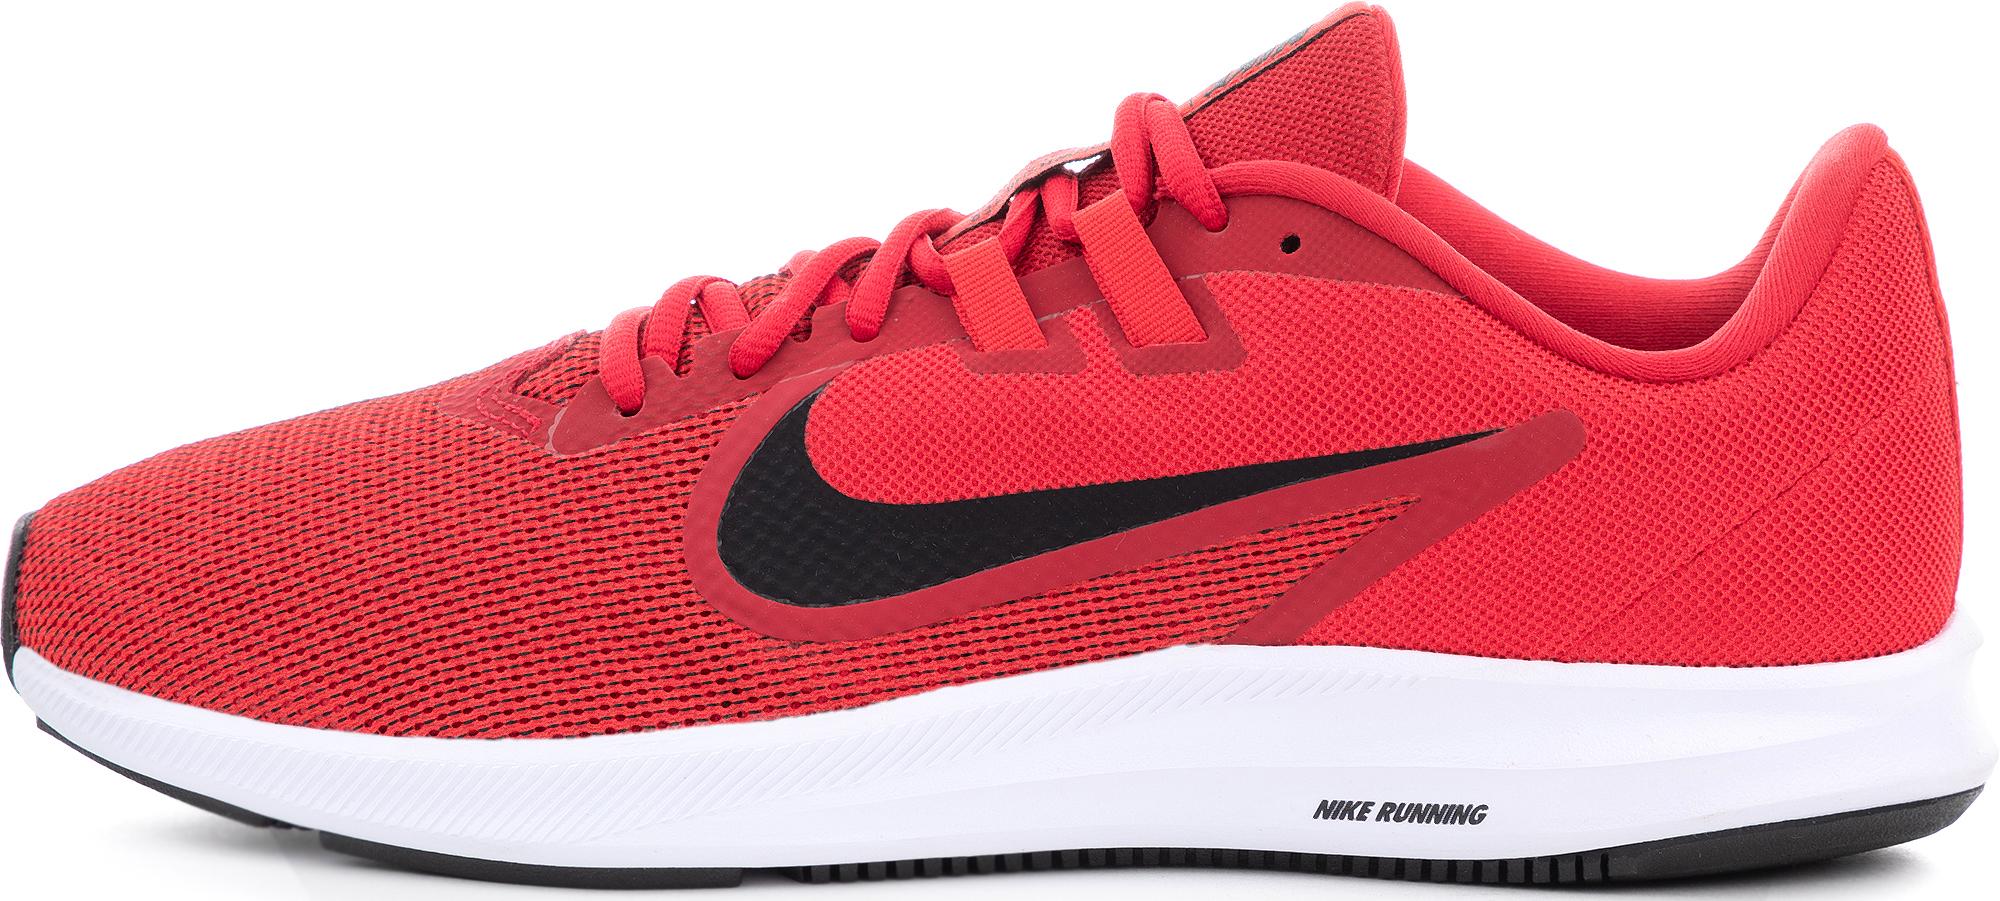 Nike Кроссовки мужские Nike Downshifter 9, размер 46,5 недорго, оригинальная цена